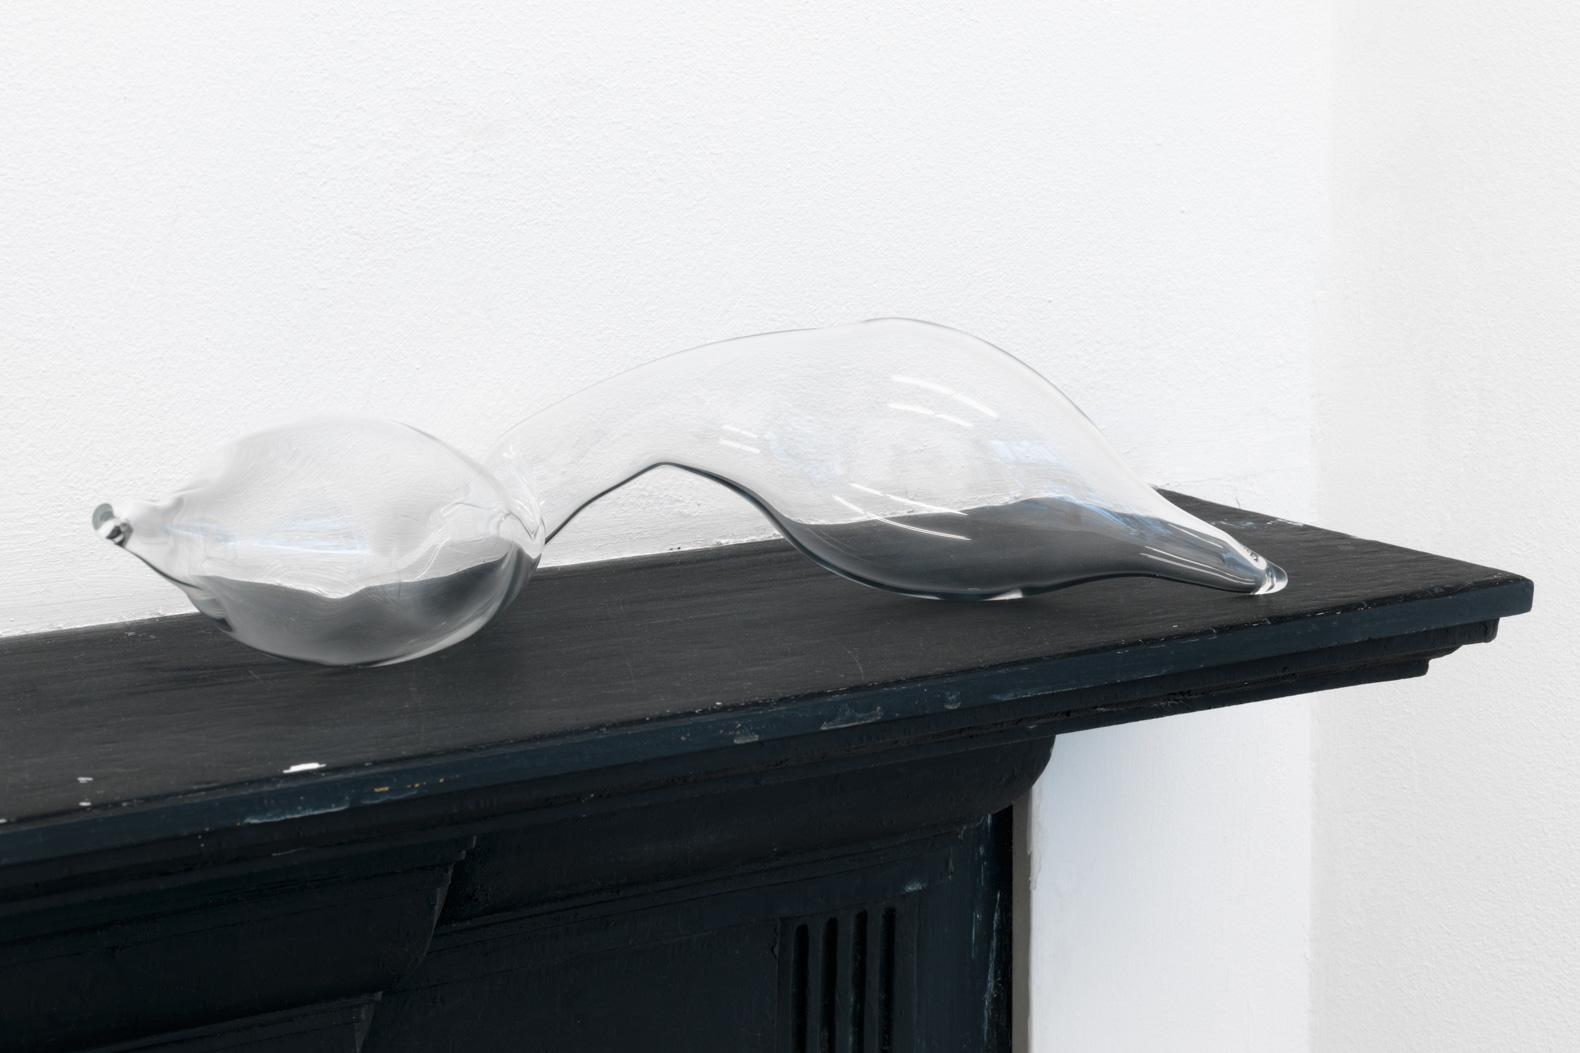 Ilona Sagar, 'Haptic Skins of a Glass Eye', 2015, Tenderpixel.